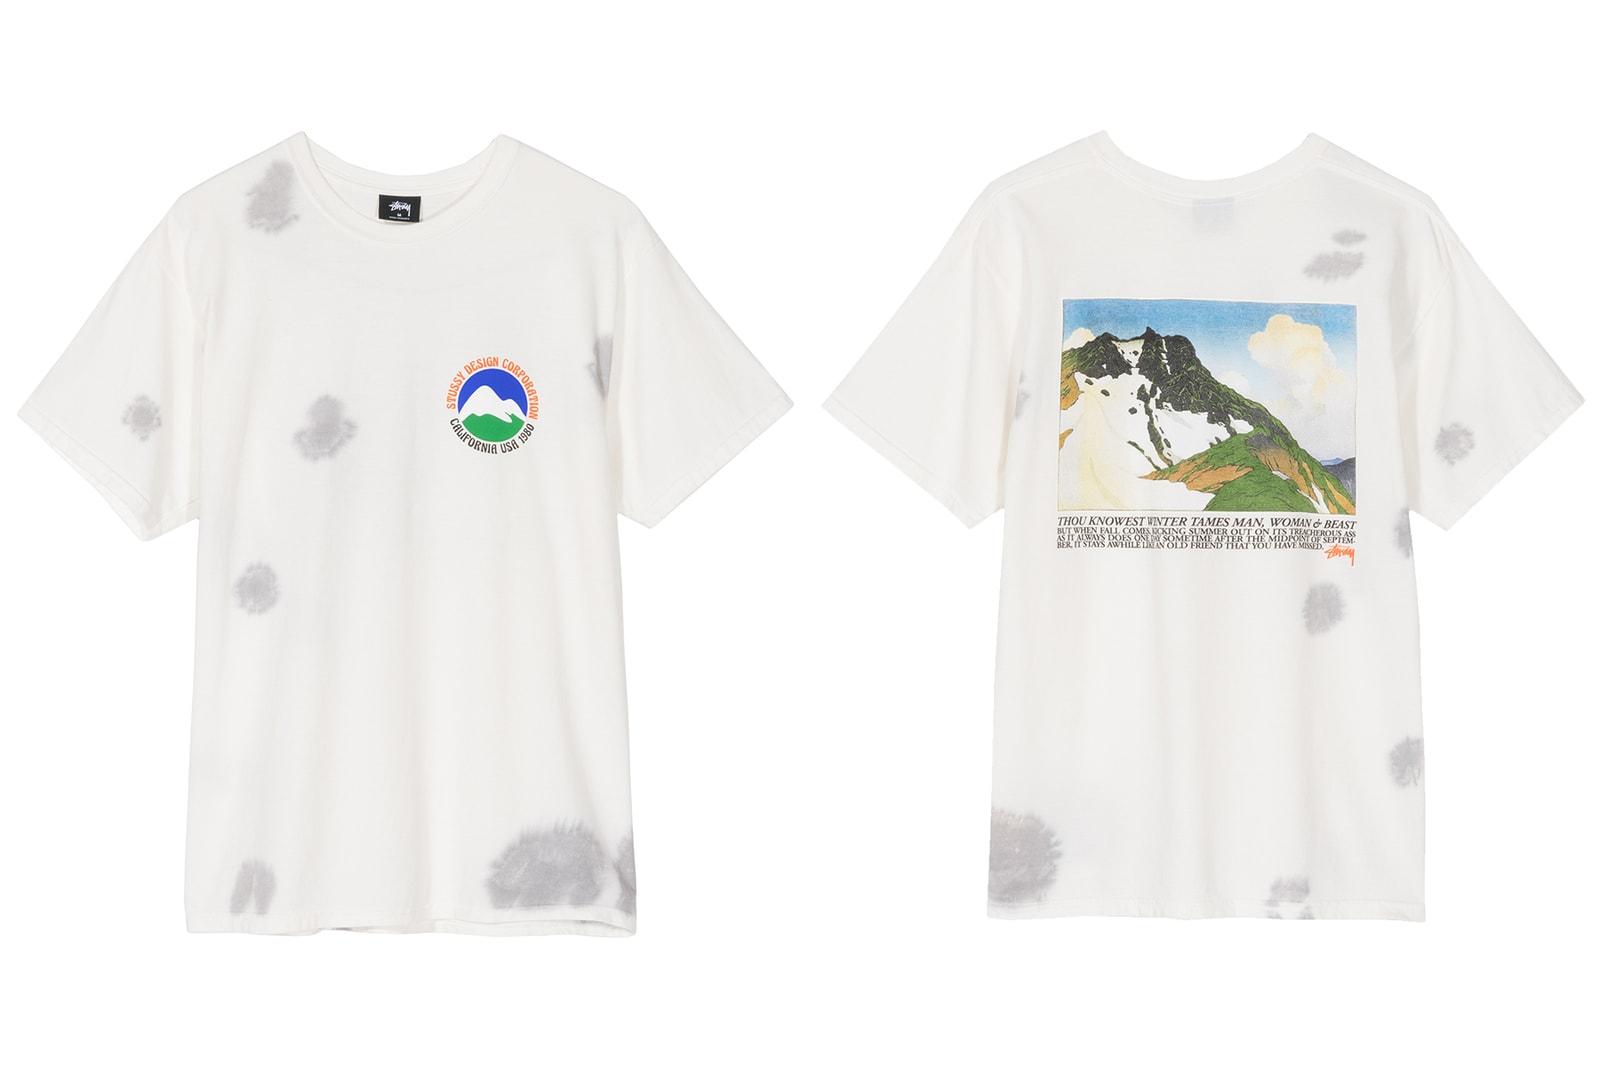 STÜSSY ステューシー 釣り フォーカス 新コレクション 発売